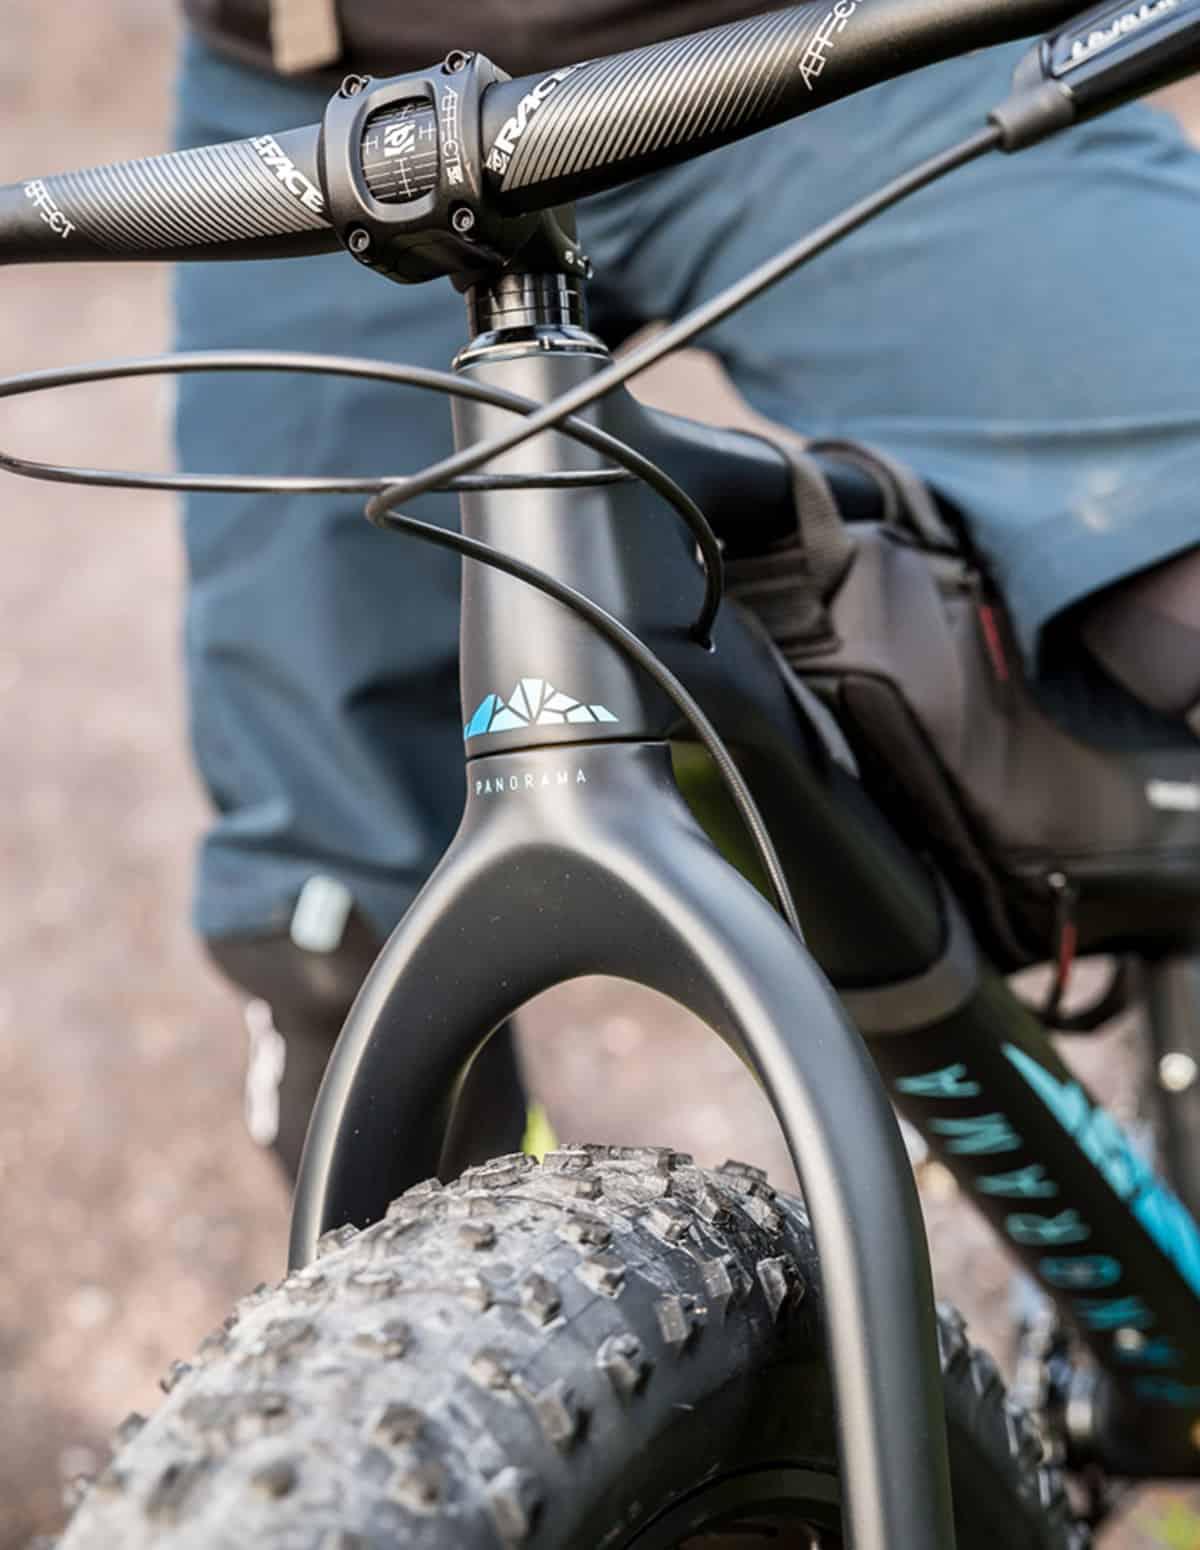 Le guidon et la potence race face du fatbike Panorama Chic-Chocs